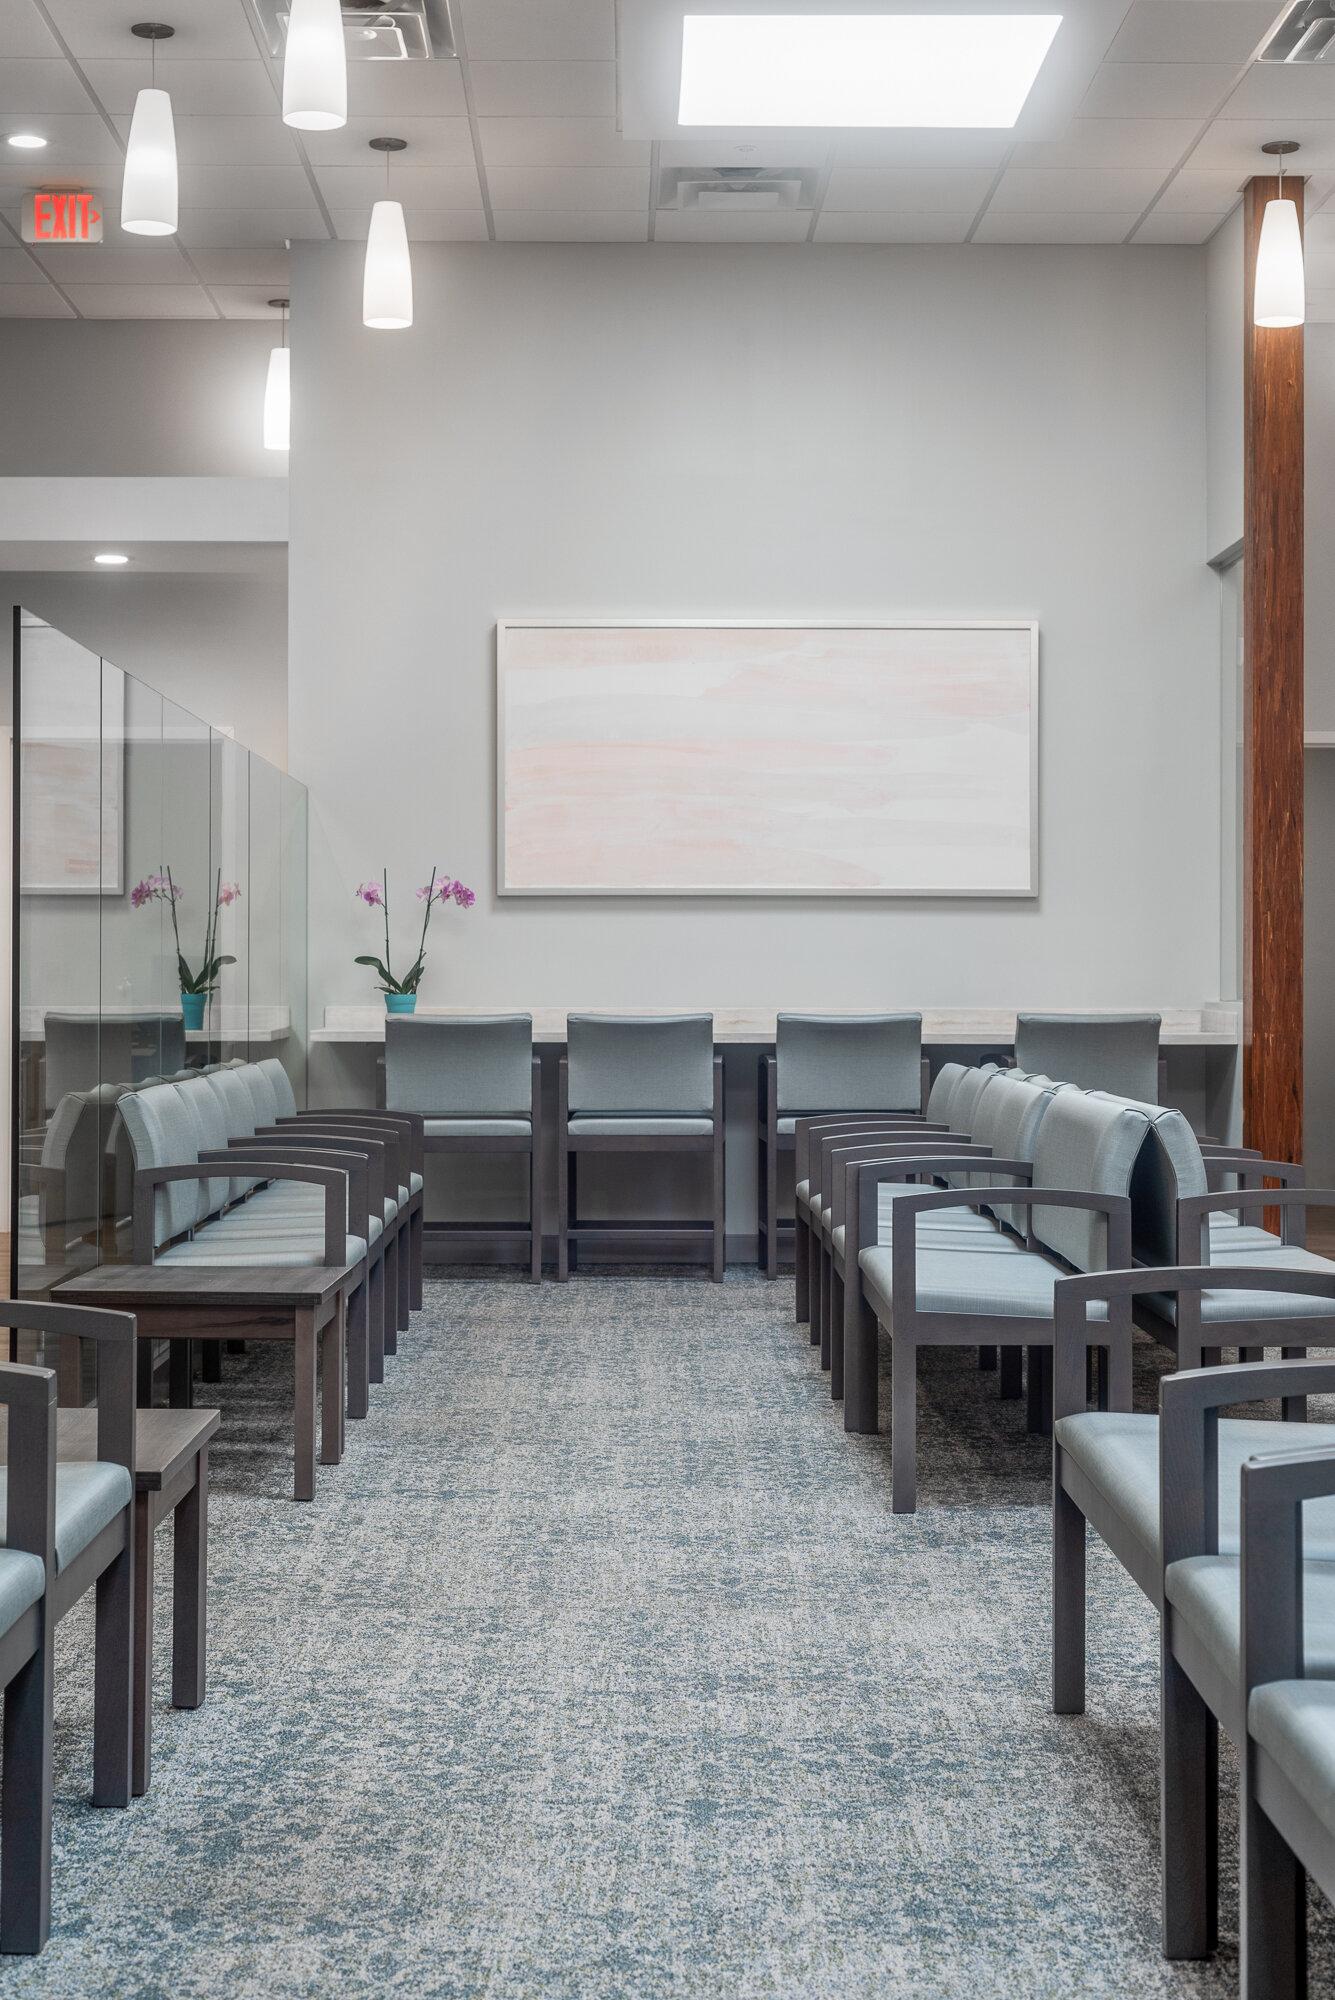 Micamy Design Studio_Interior Design_Faben Obstetrics and Gynelcology_North Florida_Riverplace_San Marco_Healthcare_Office_Medical_Trwobridge_Renovation_Patcraft_Stance_ArcCom (2).jpg